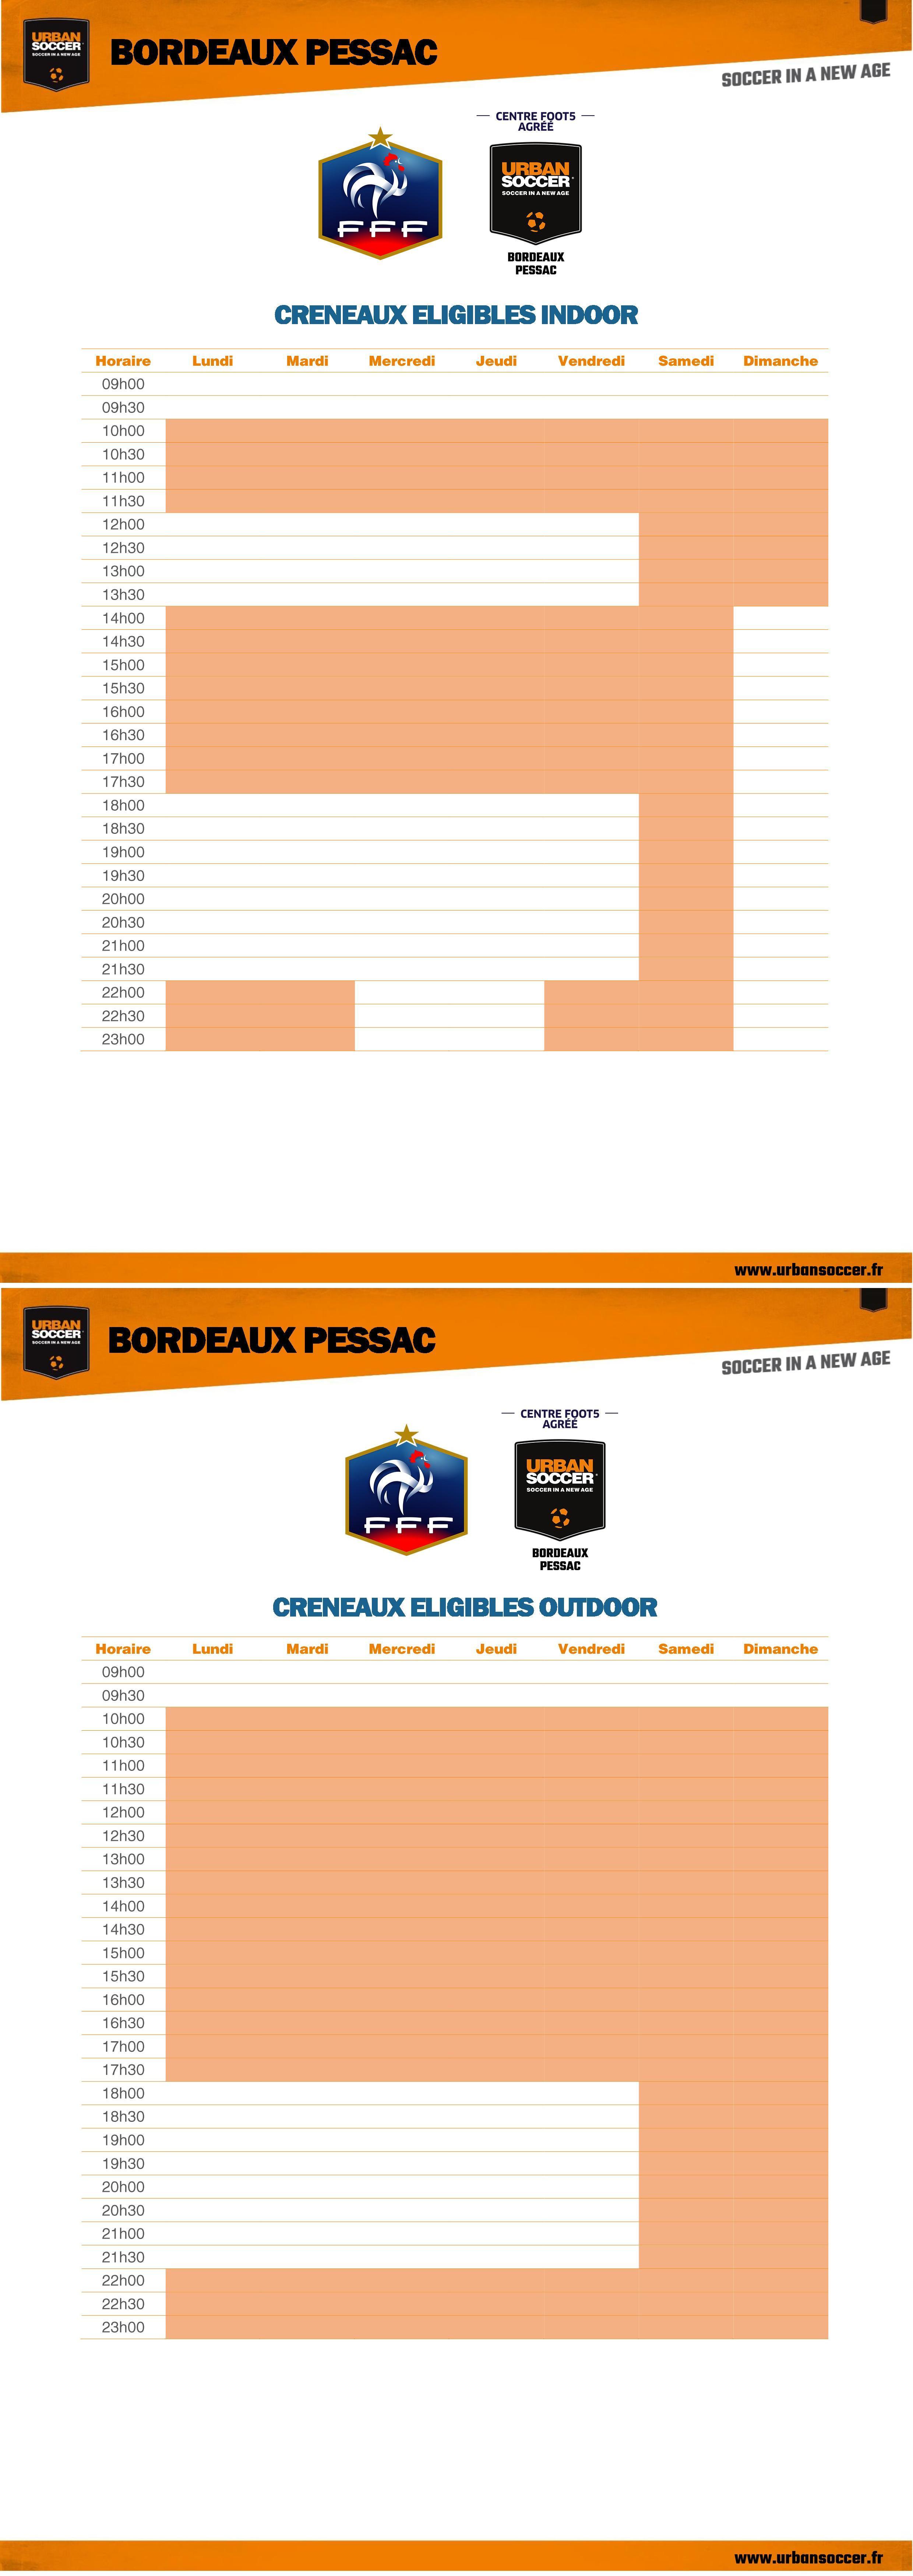 Heures FFF - Bordeaux Pessac